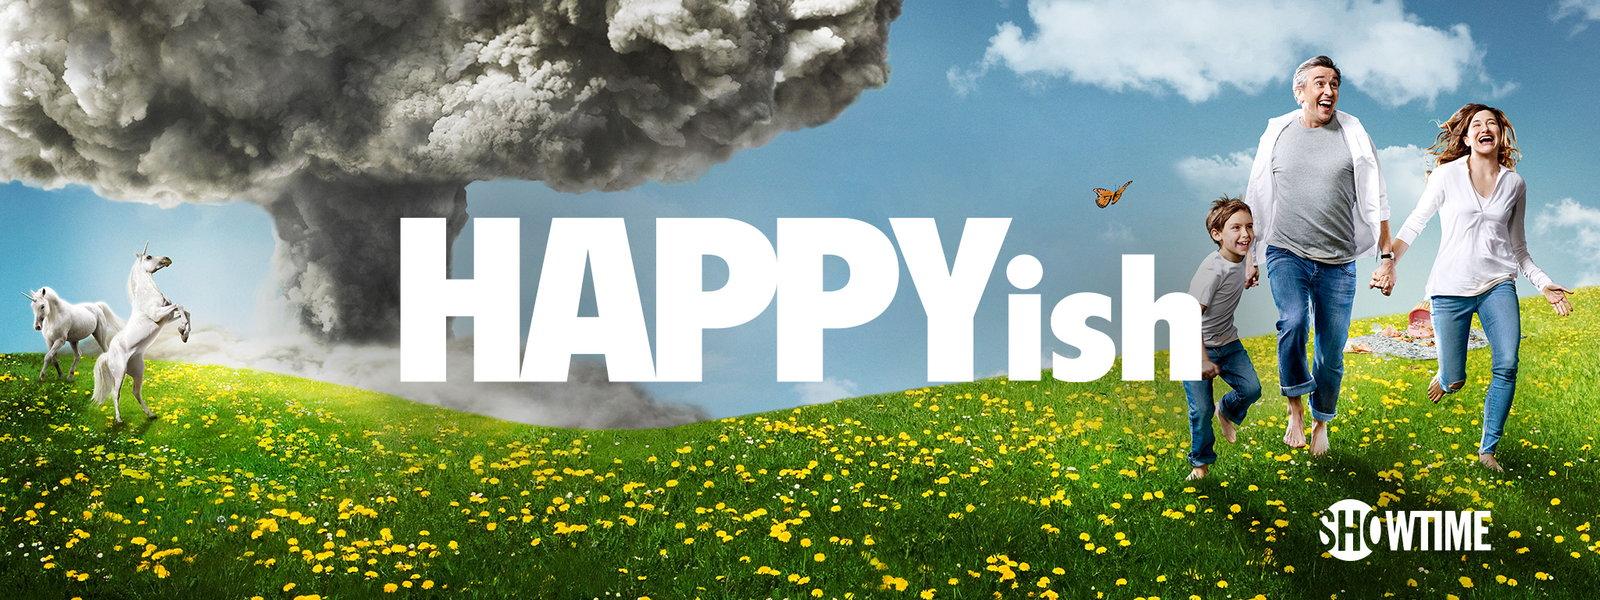 Serien-Tipp: HAPPYish